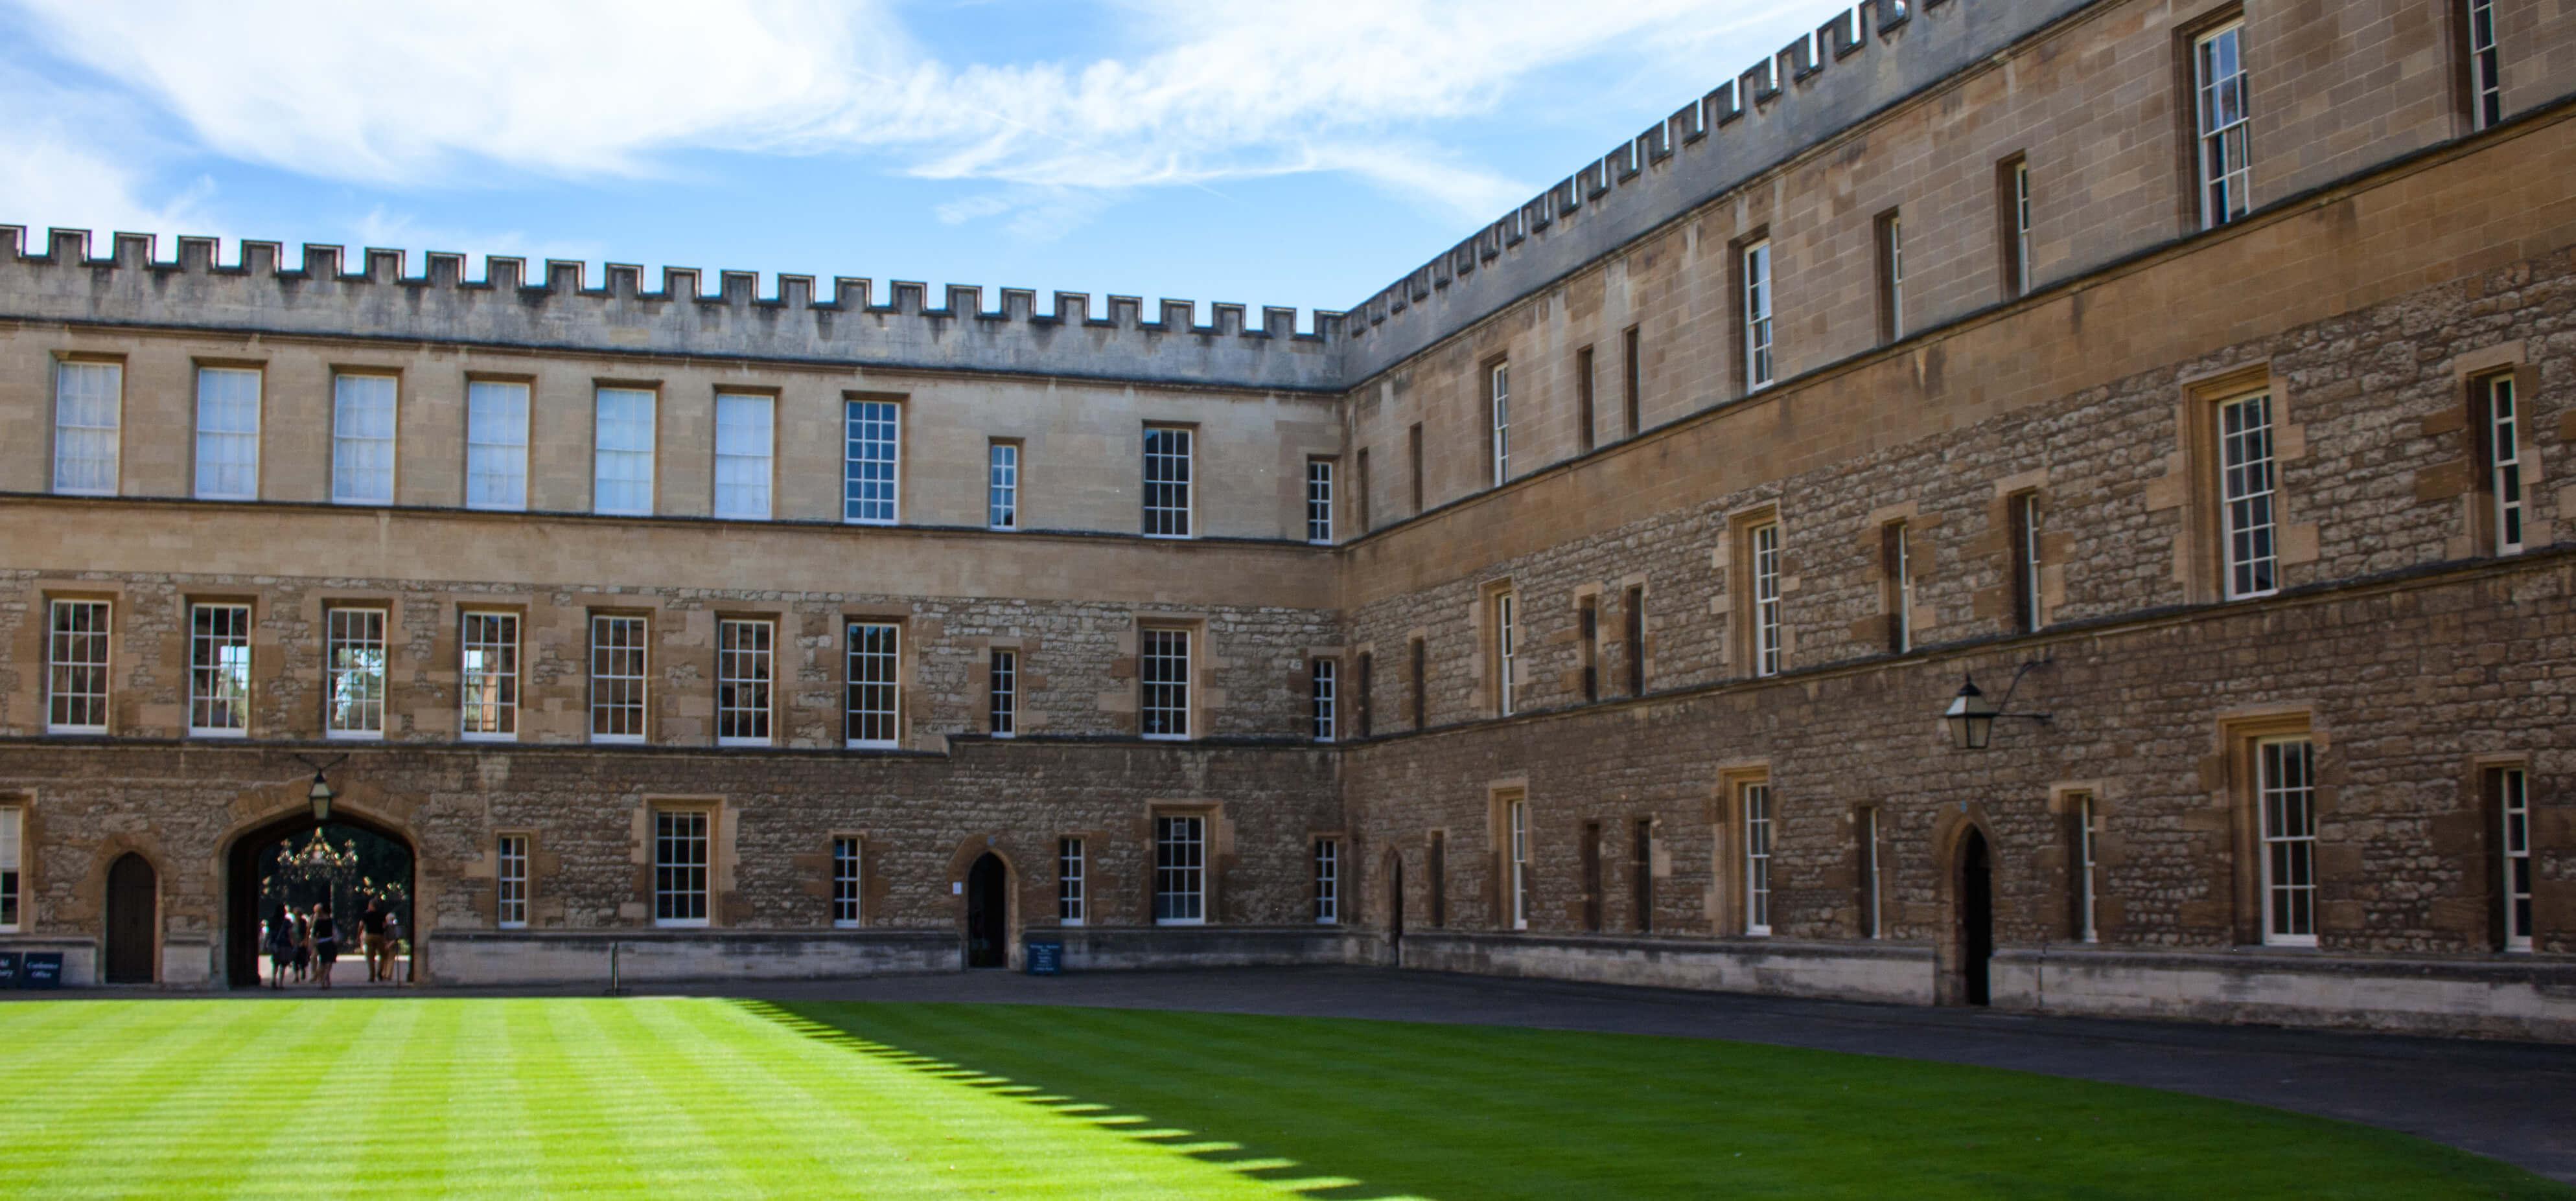 International Human Rights Law Programmes at Oxford